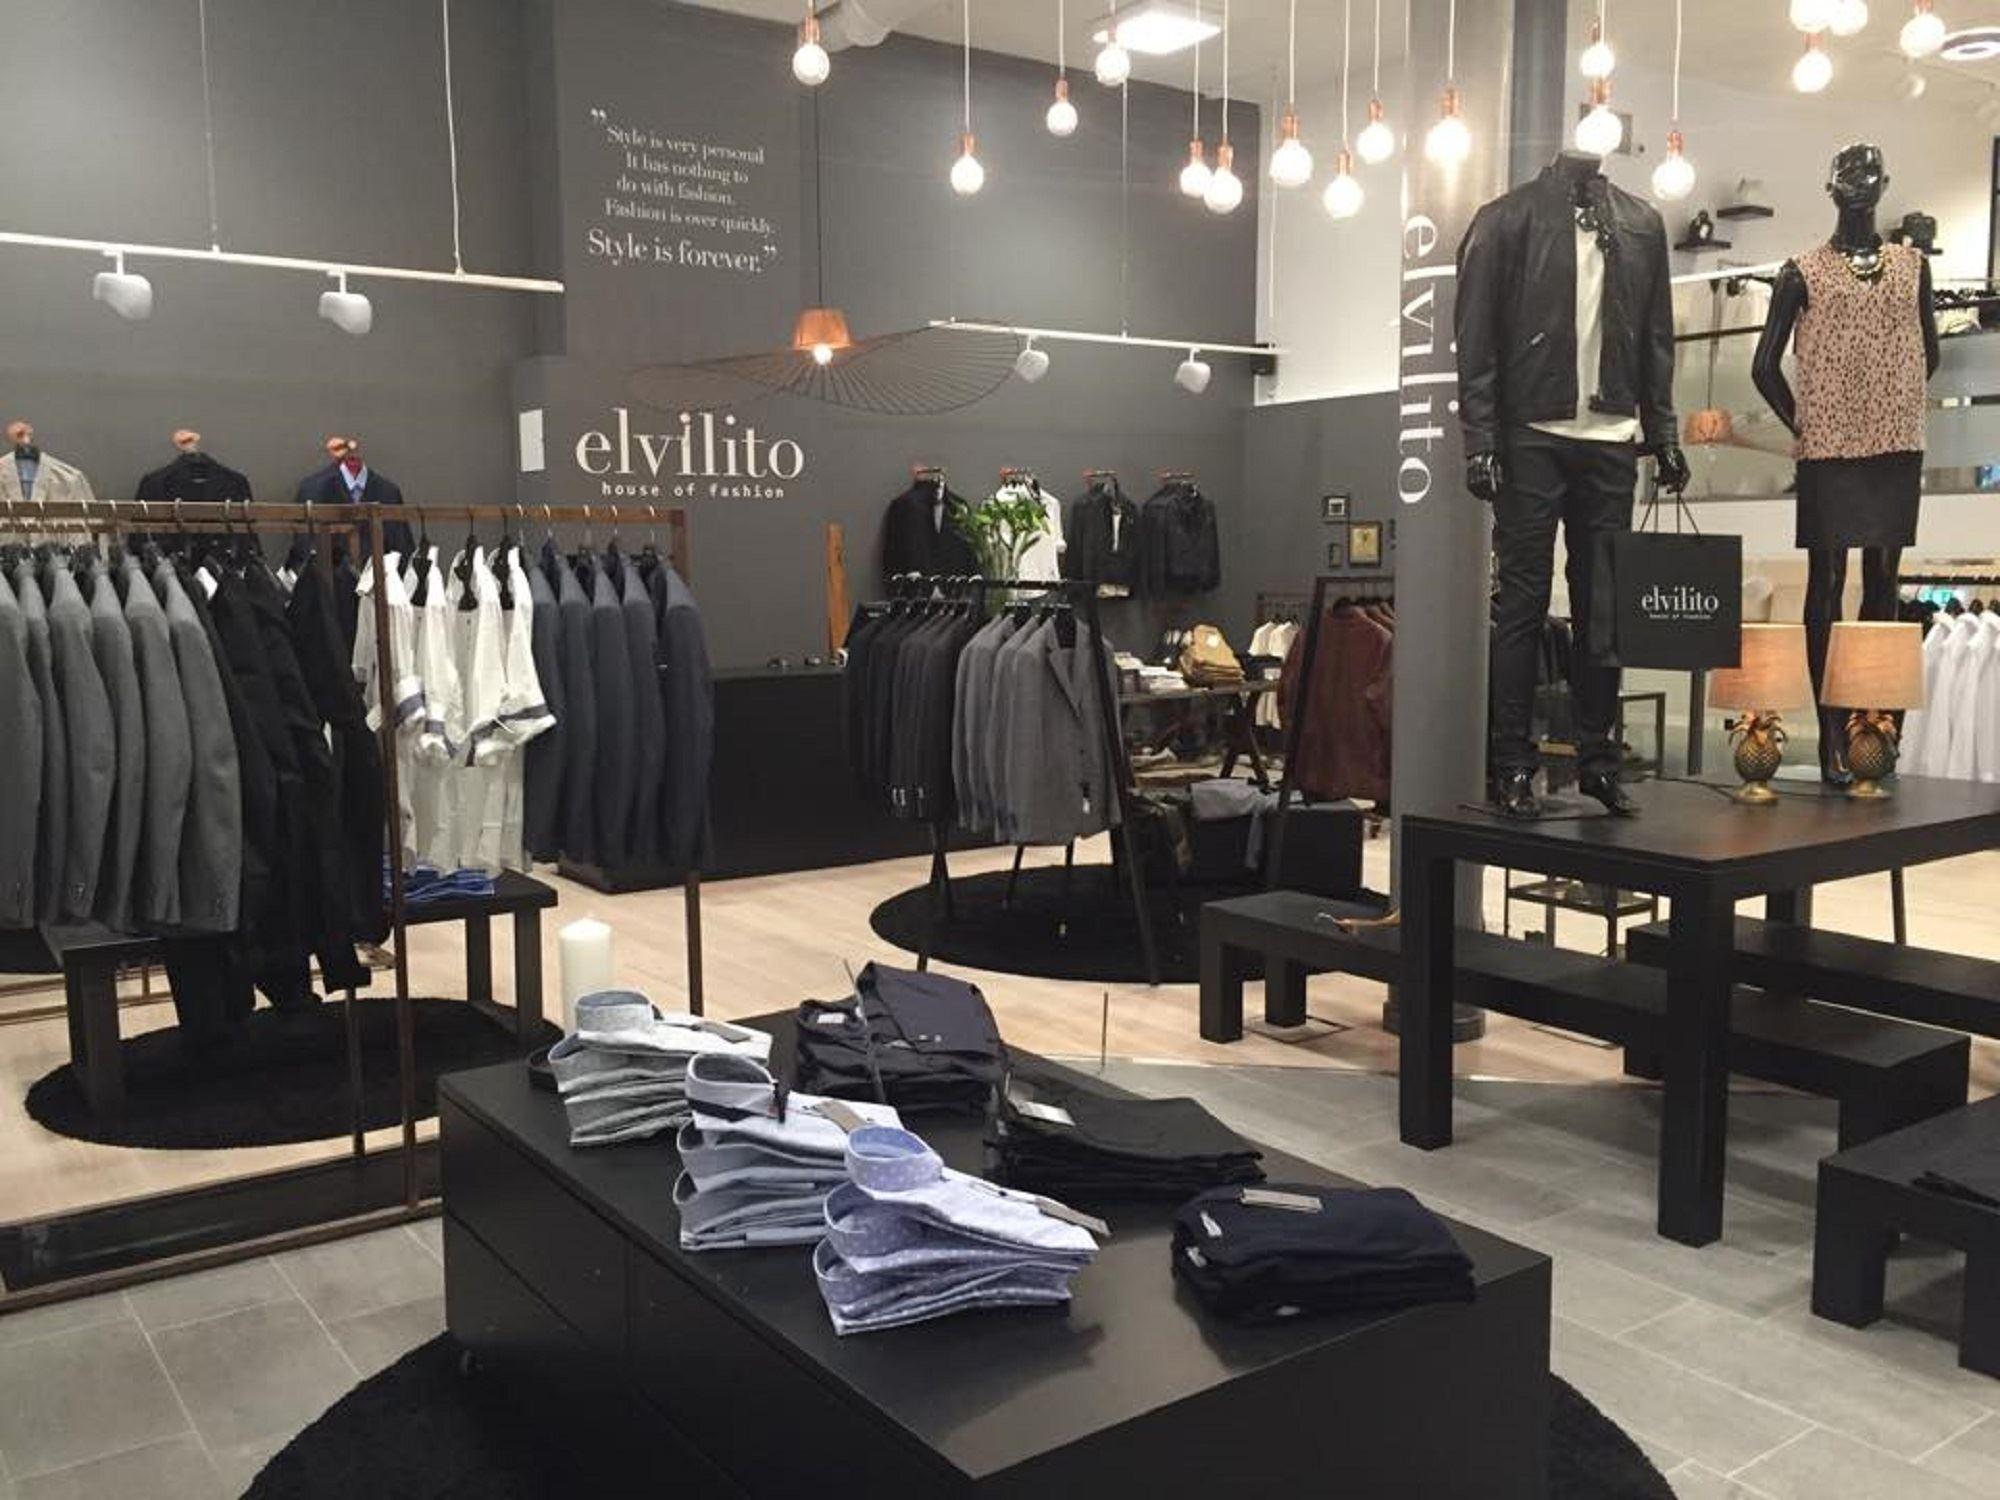 Elvilito - House of fashion